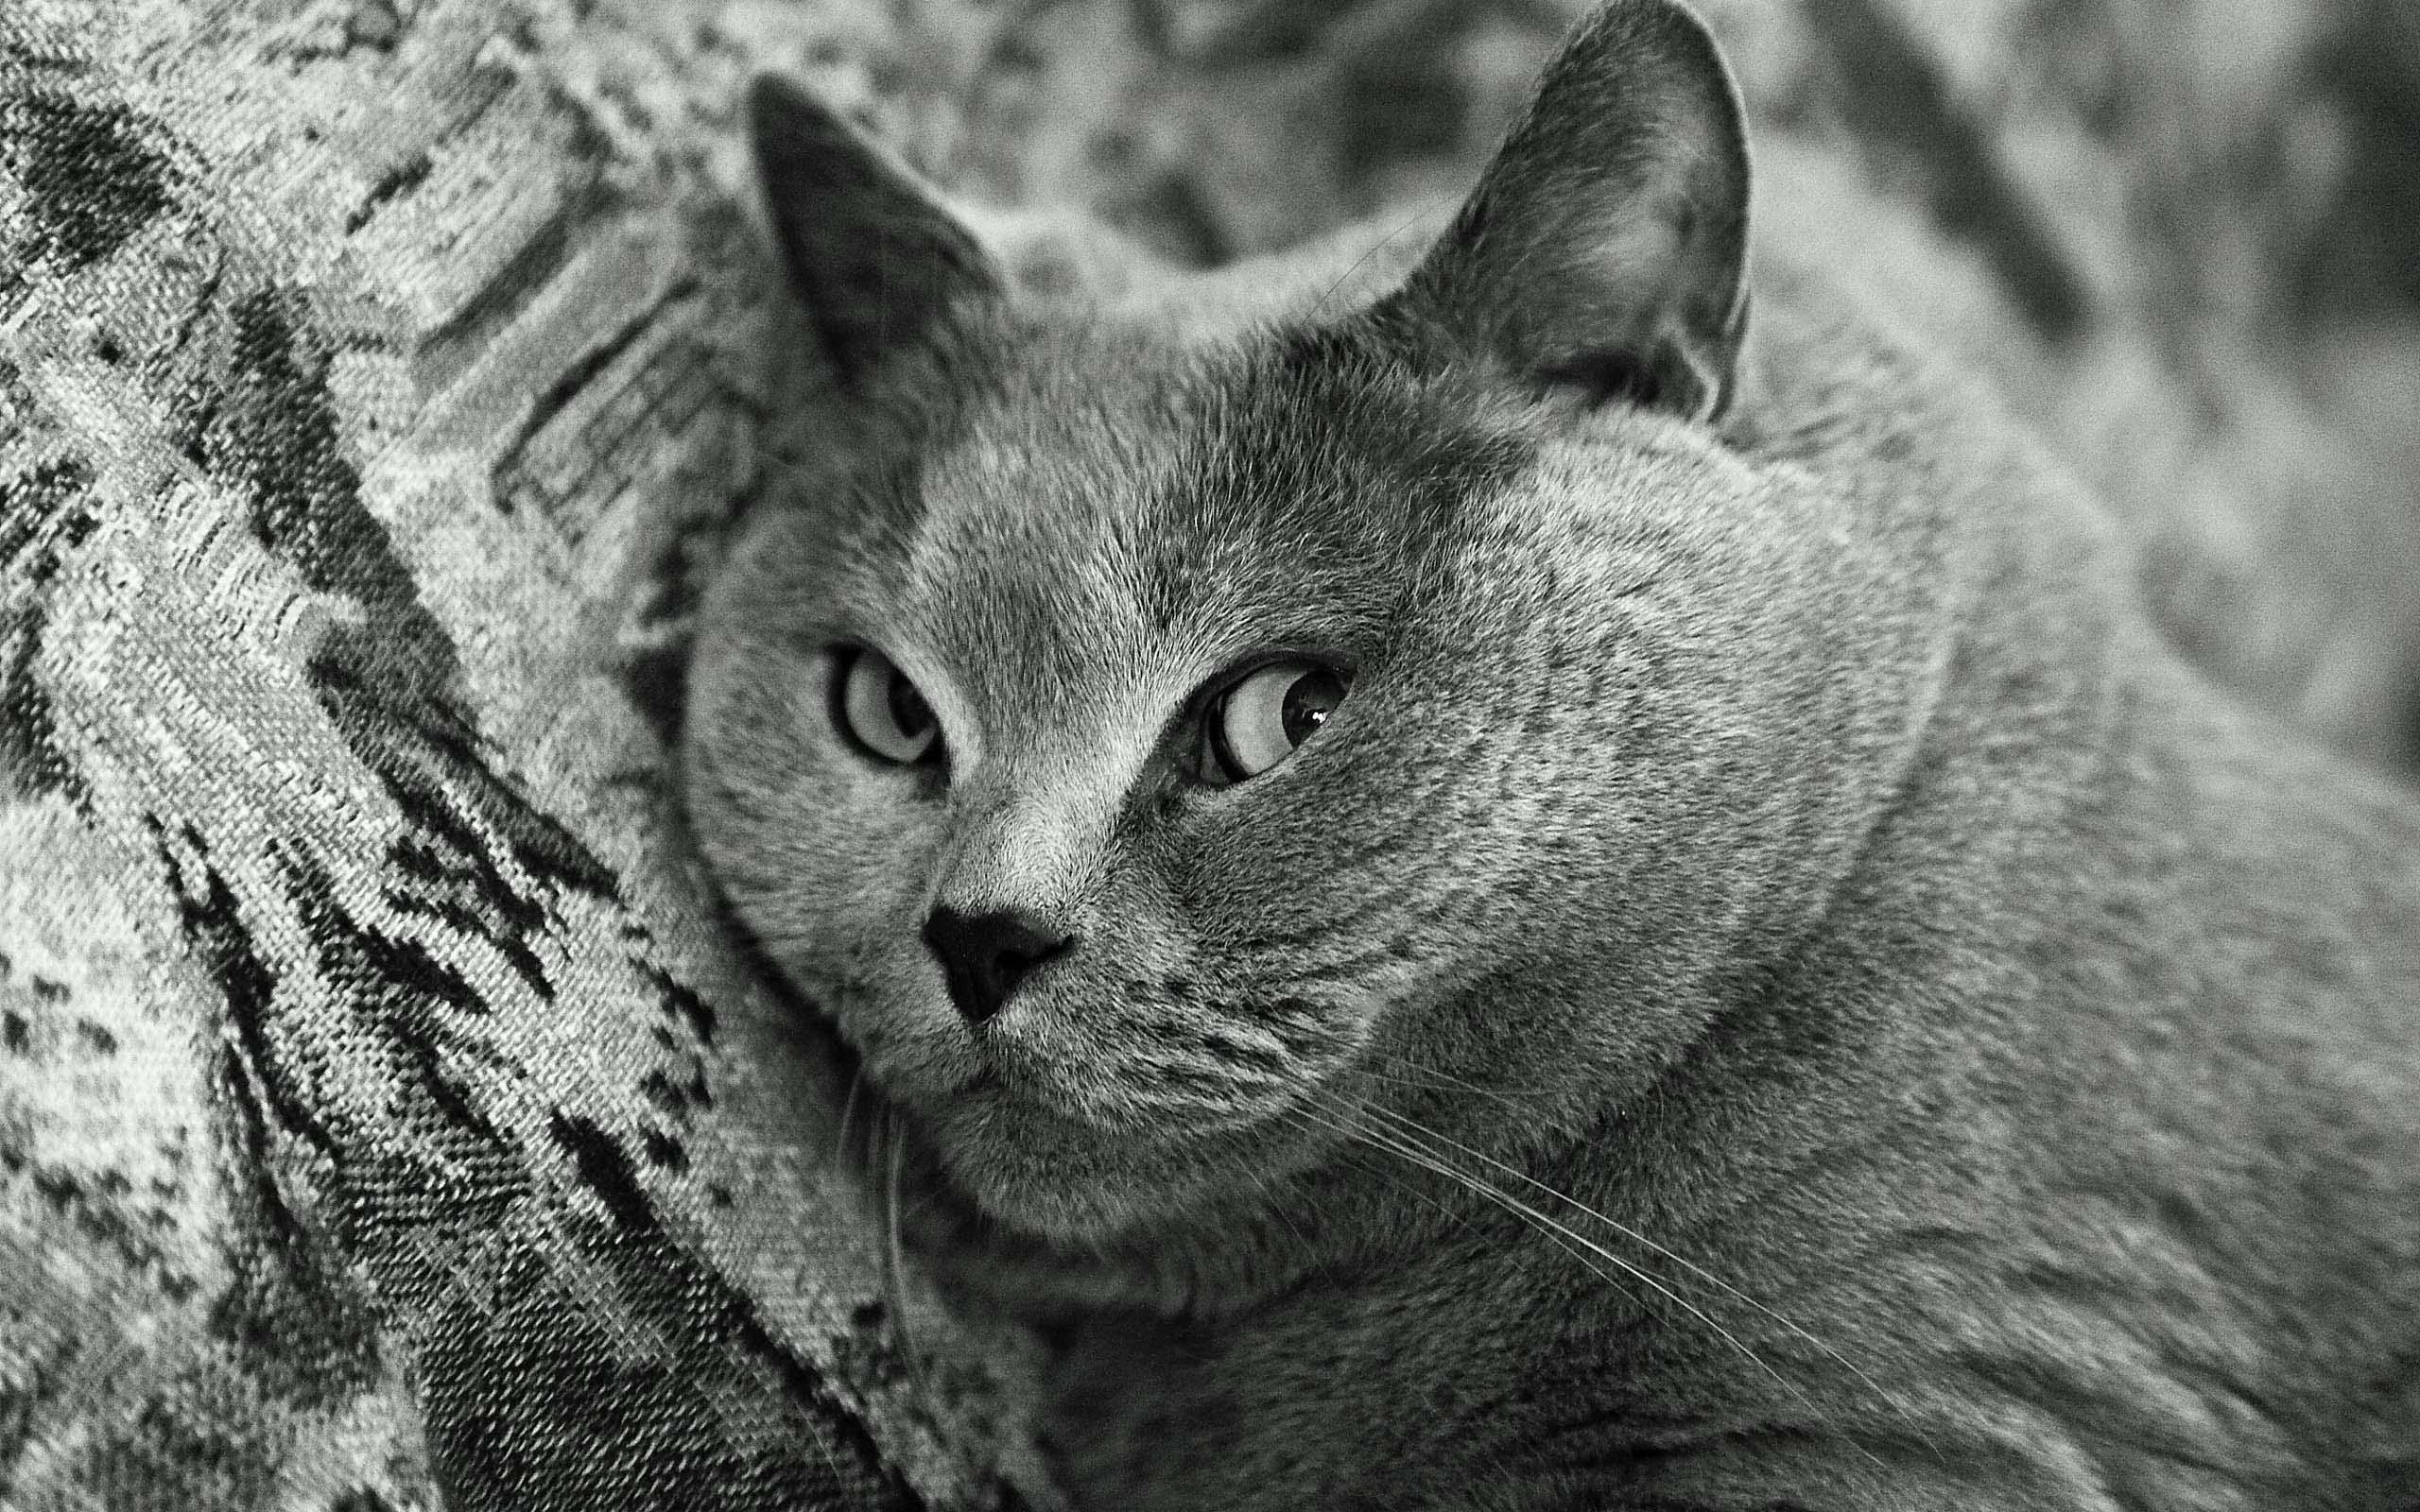 stunning-black-and-white-gray-cat-4k-wallpaper